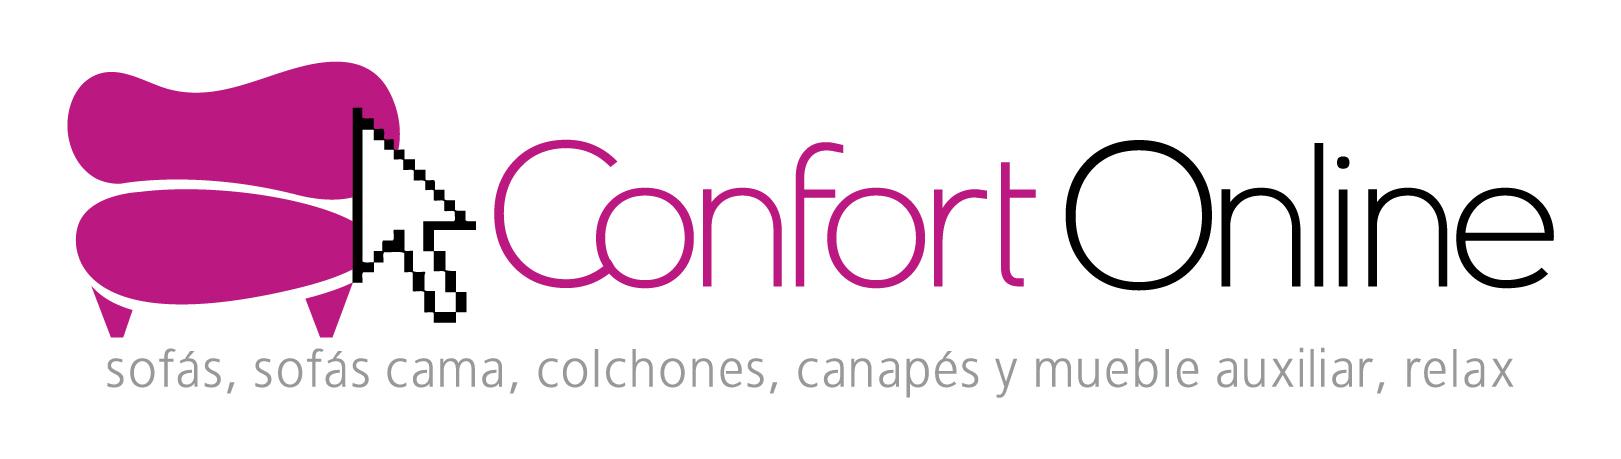 confor online